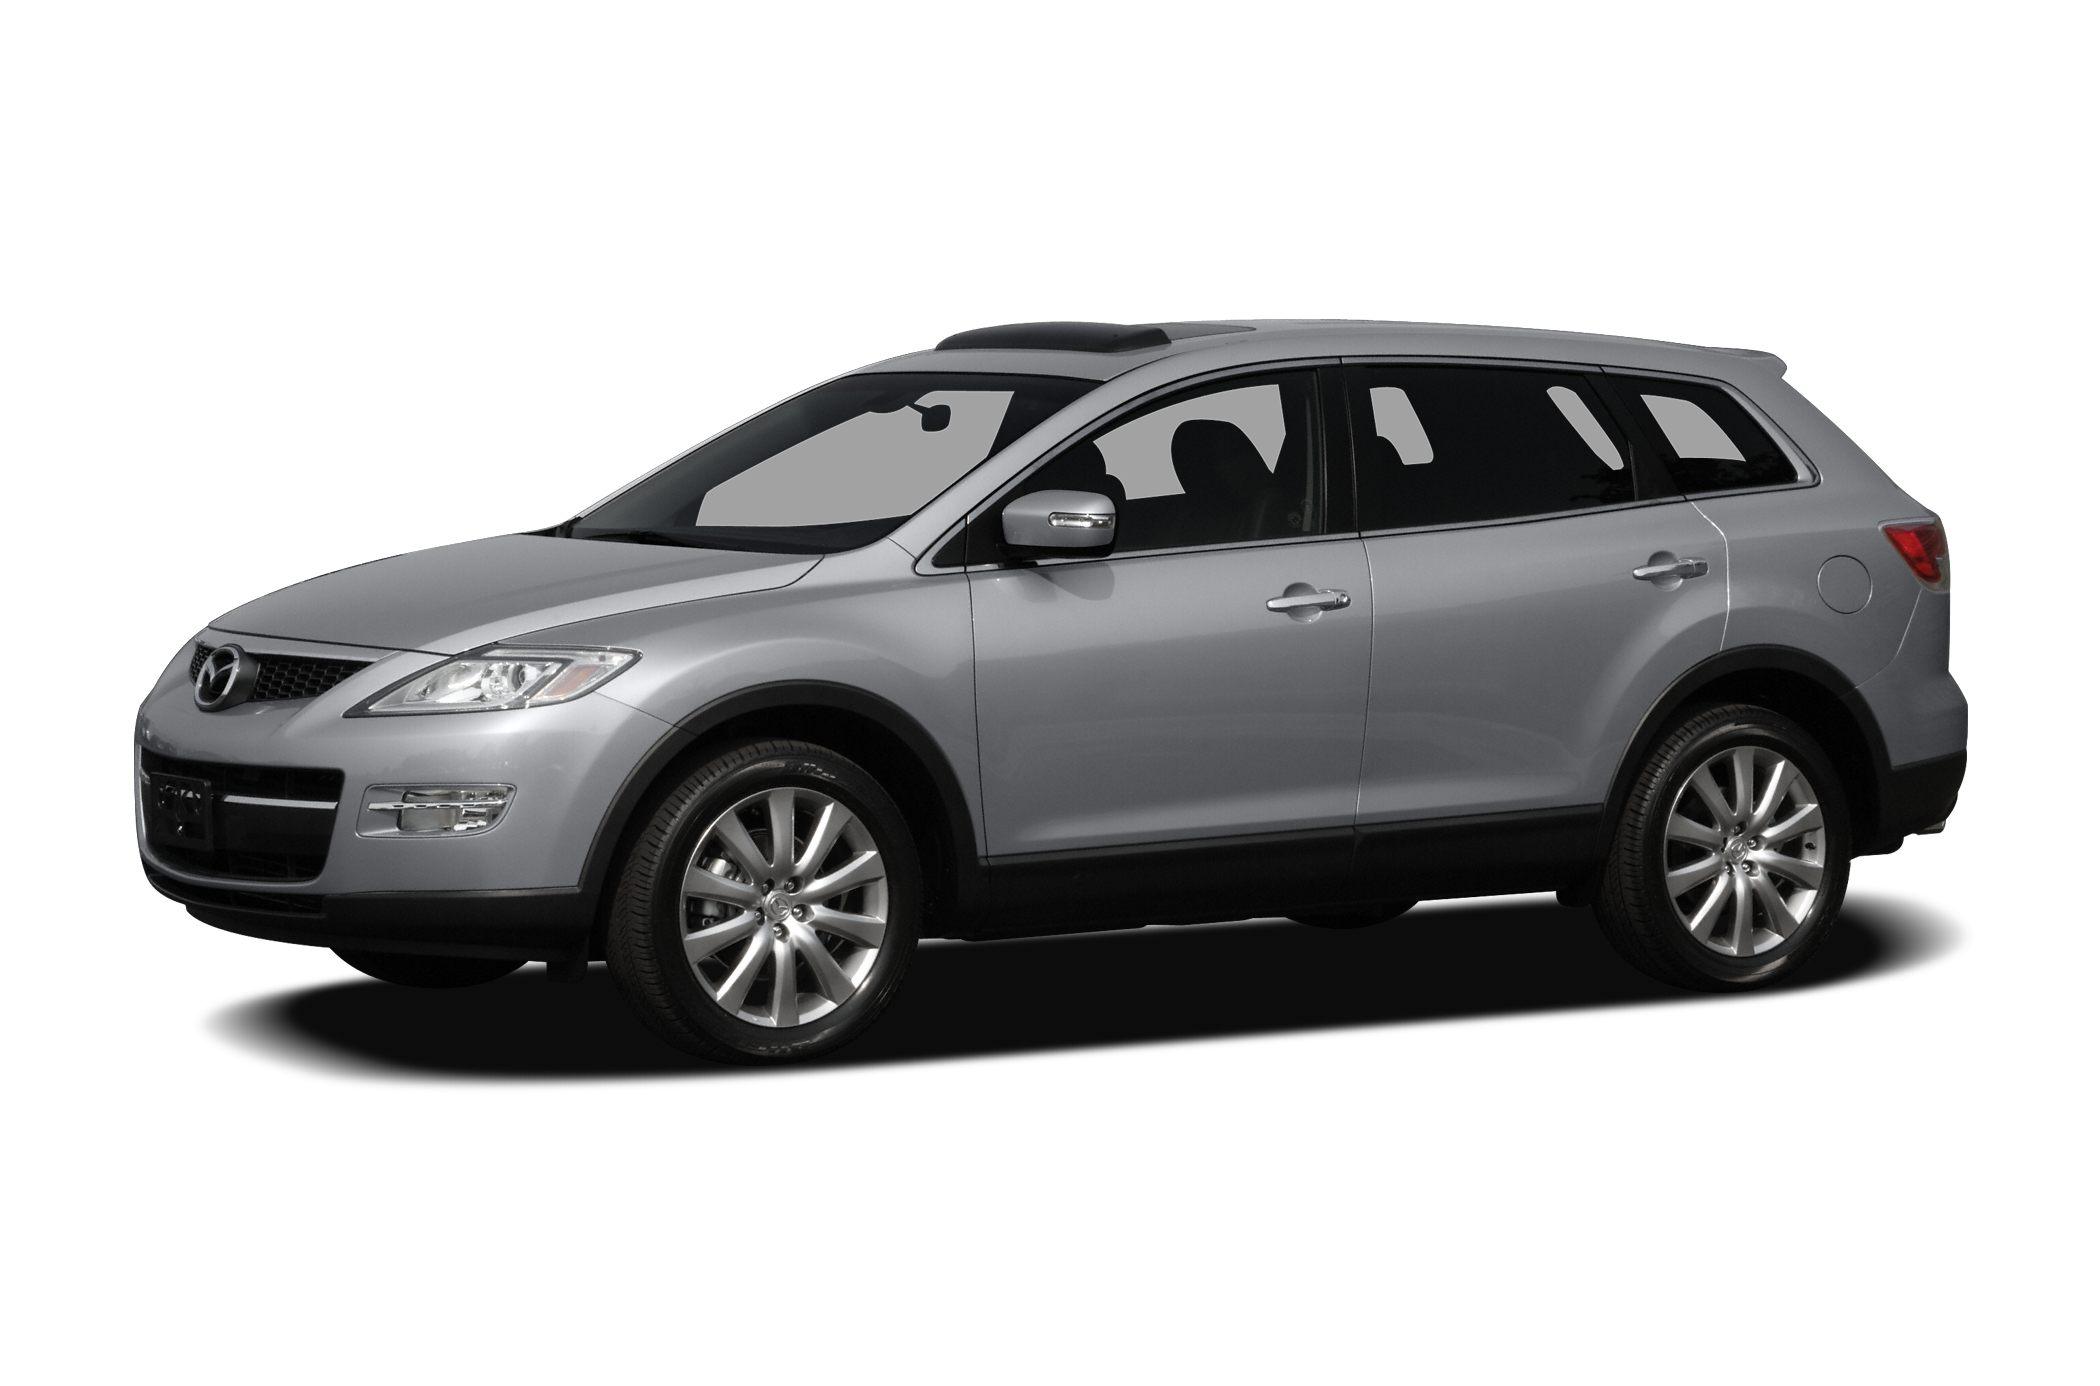 2009 Mazda CX-9 Touring SUV for sale in Murfreesboro for $13,950 with 79,175 miles